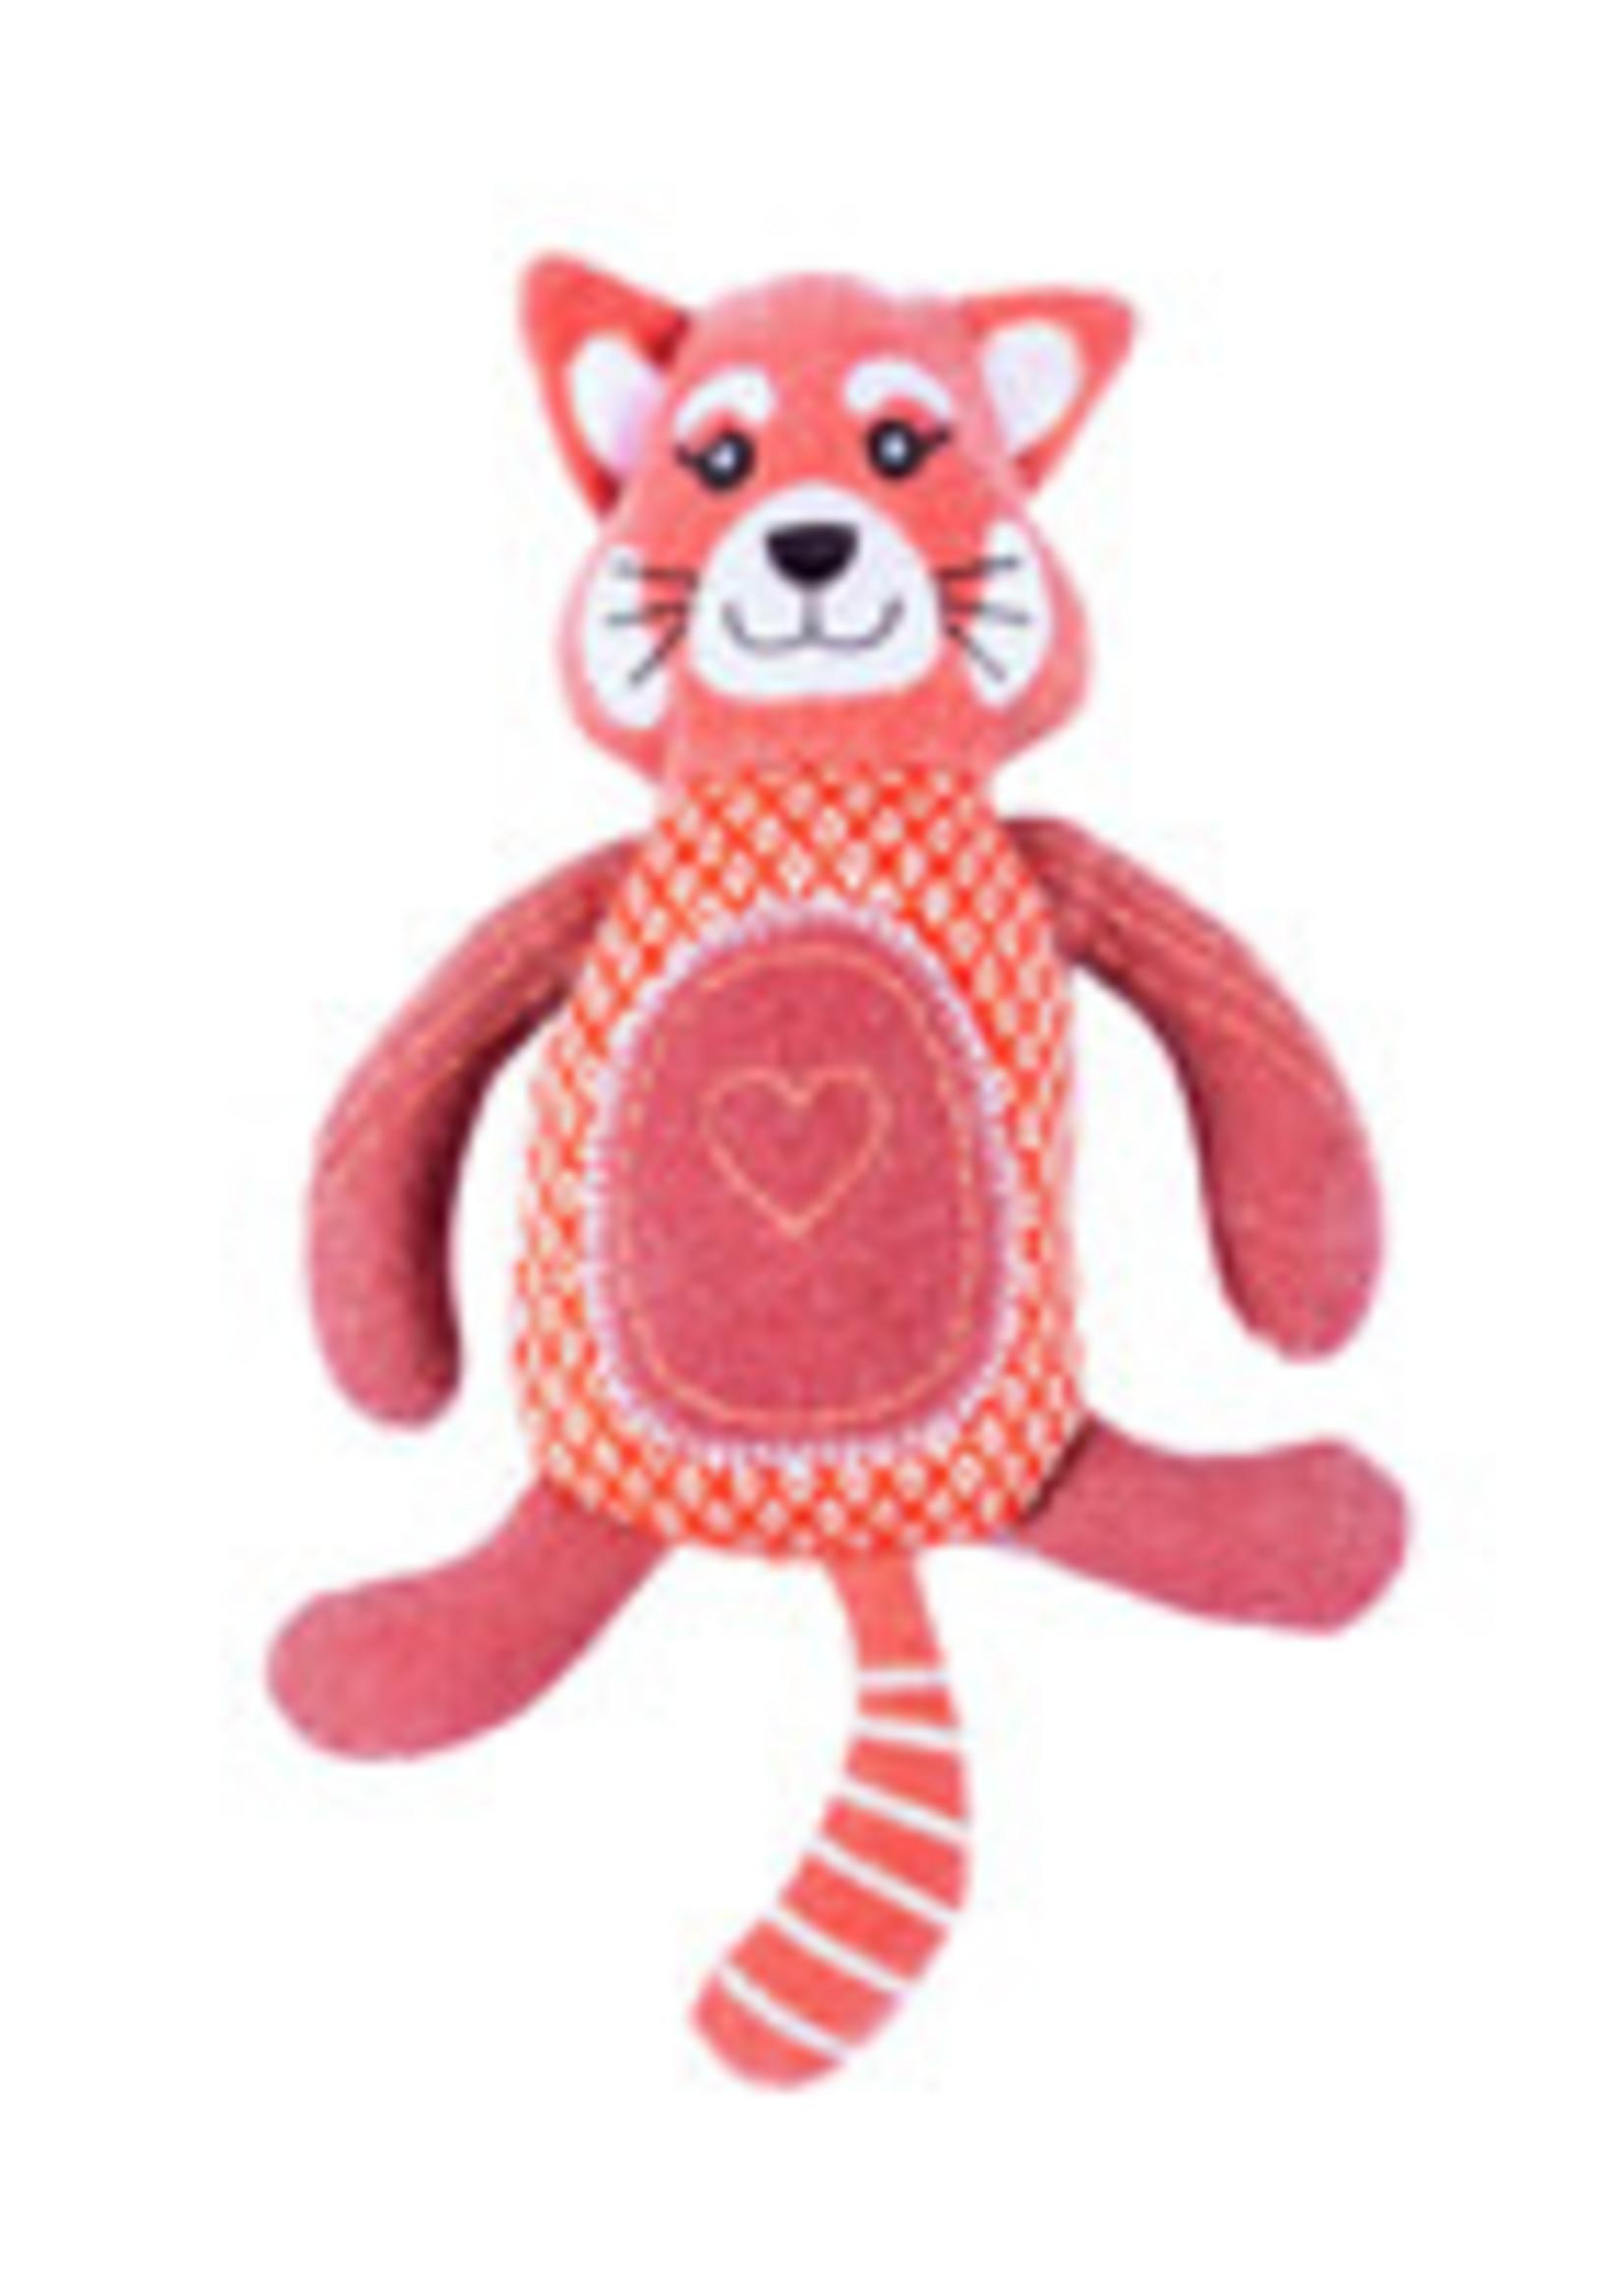 Resploot Resploot Toy – Red Panda – China - 32 x 25 cm (12.5 x 10 in)